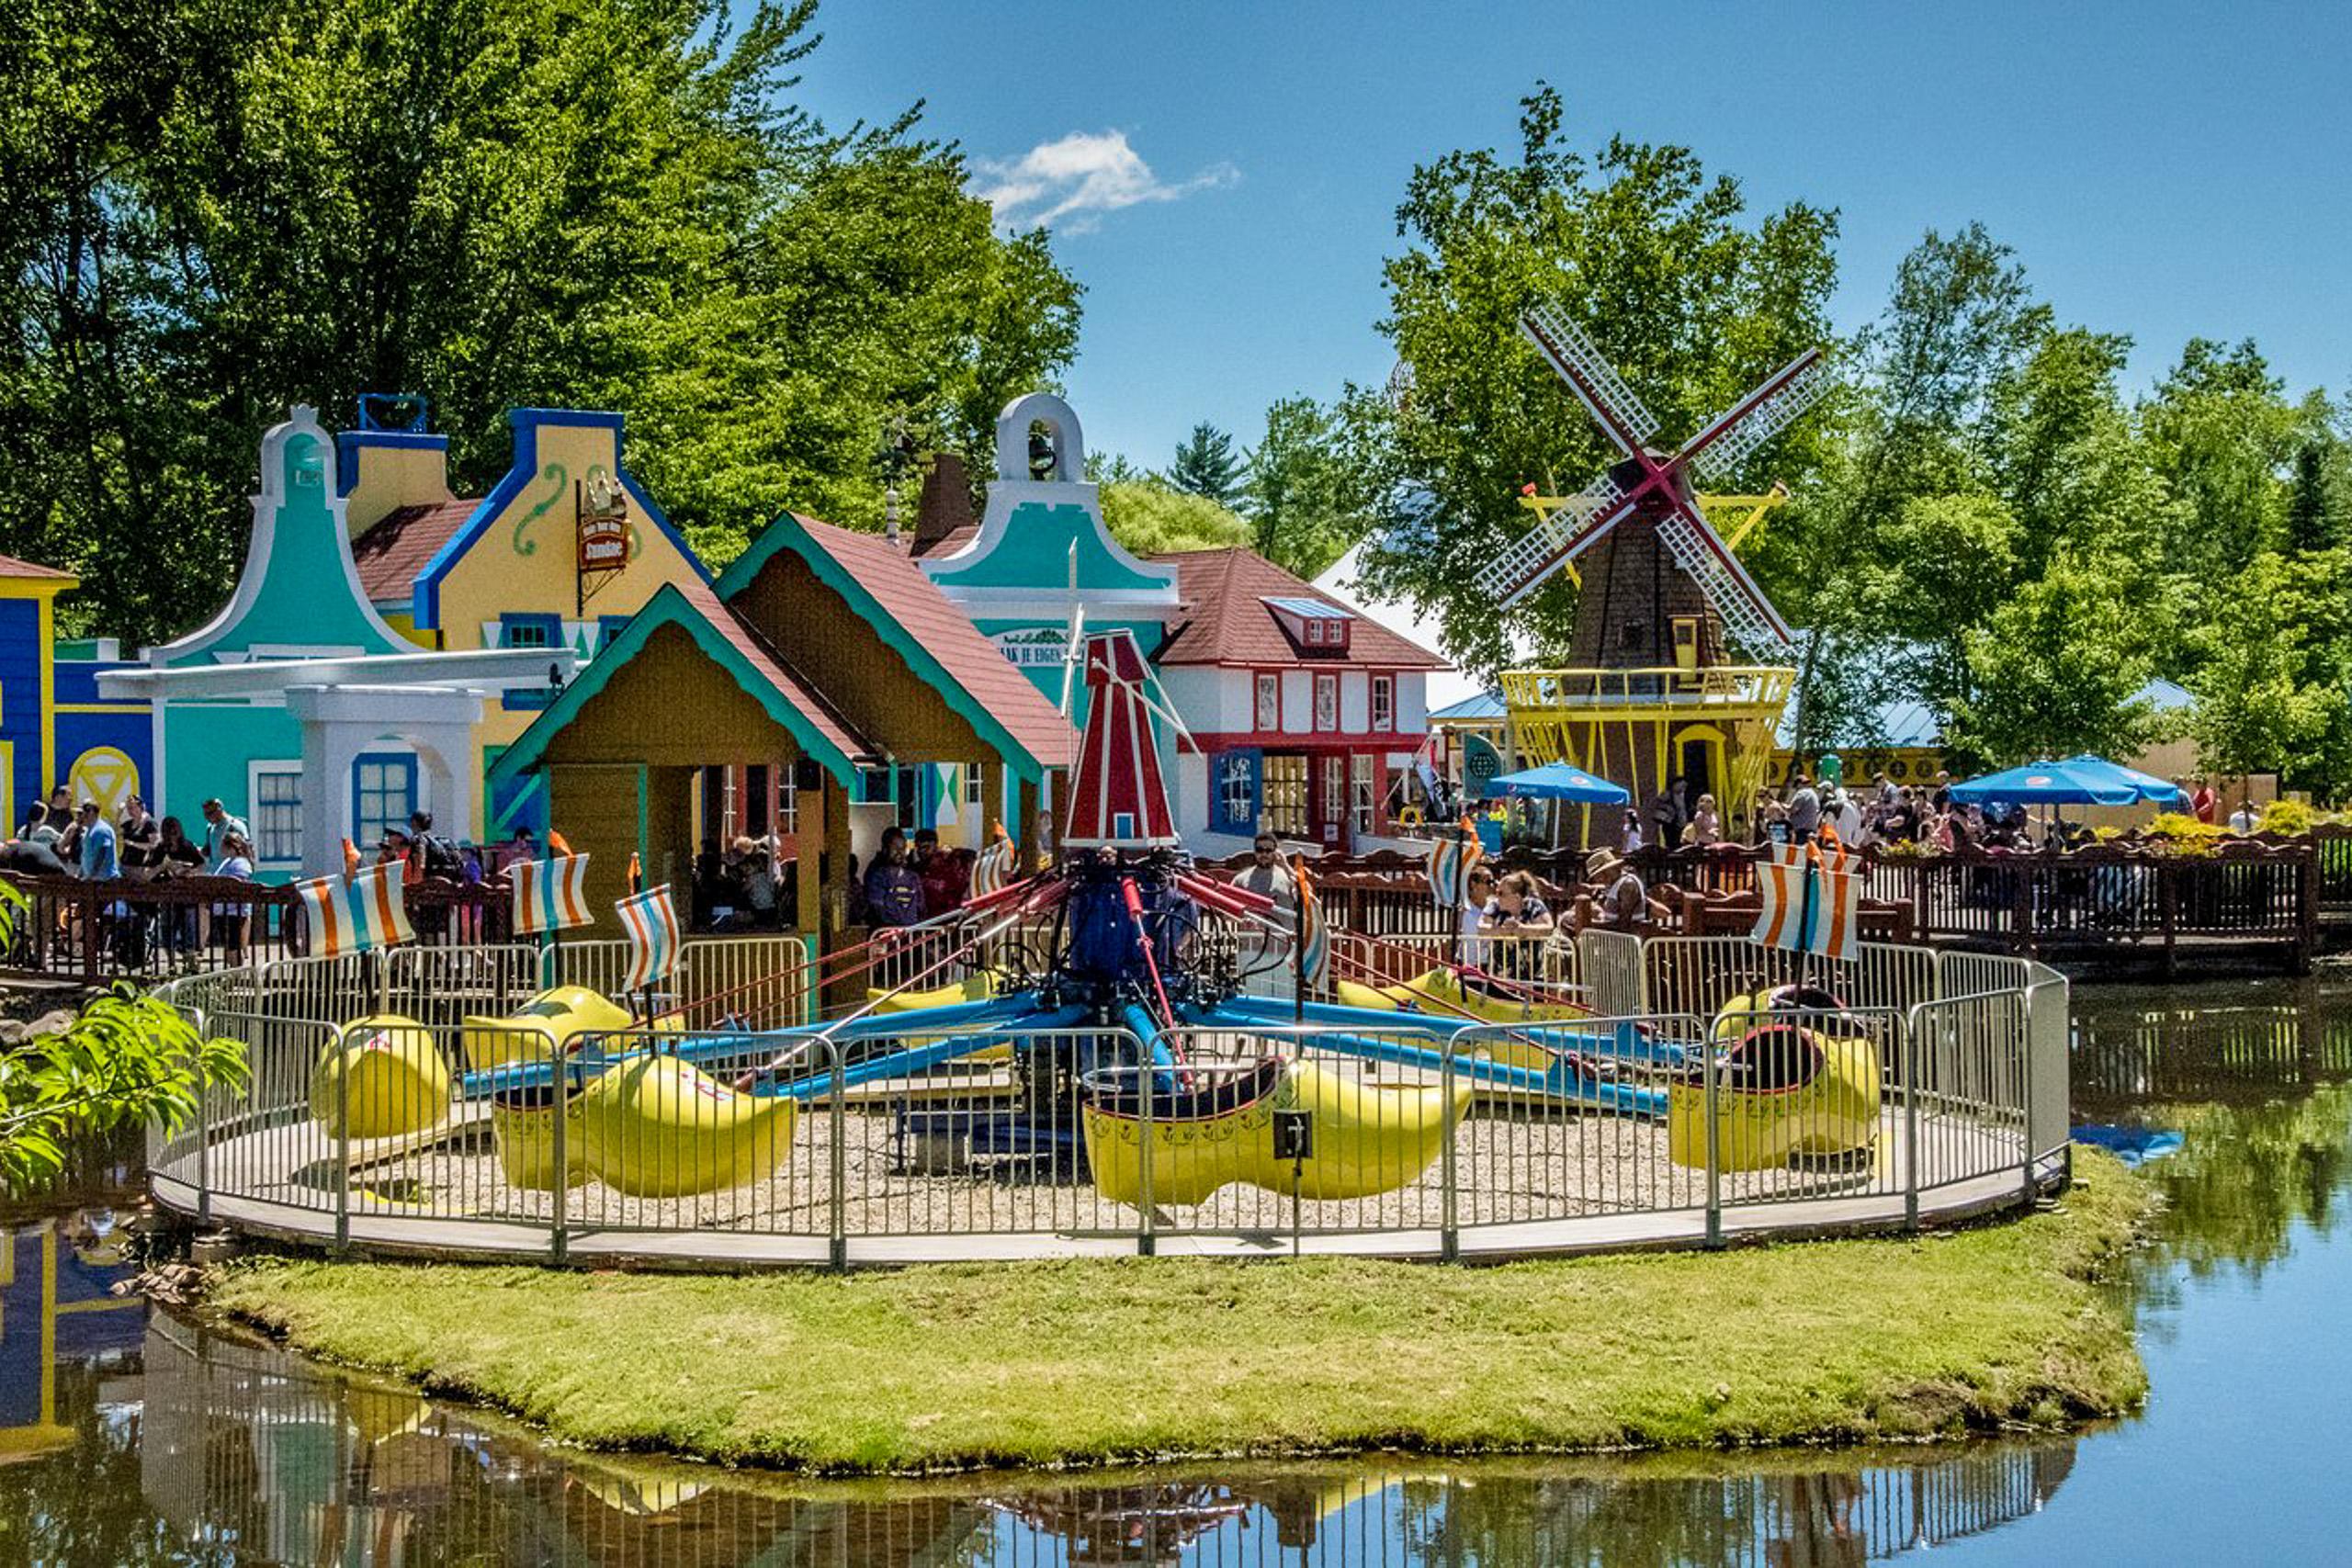 Flying Shoes Ride at Storyland; Courtesy of TripAdvisor Traveler/Scott L